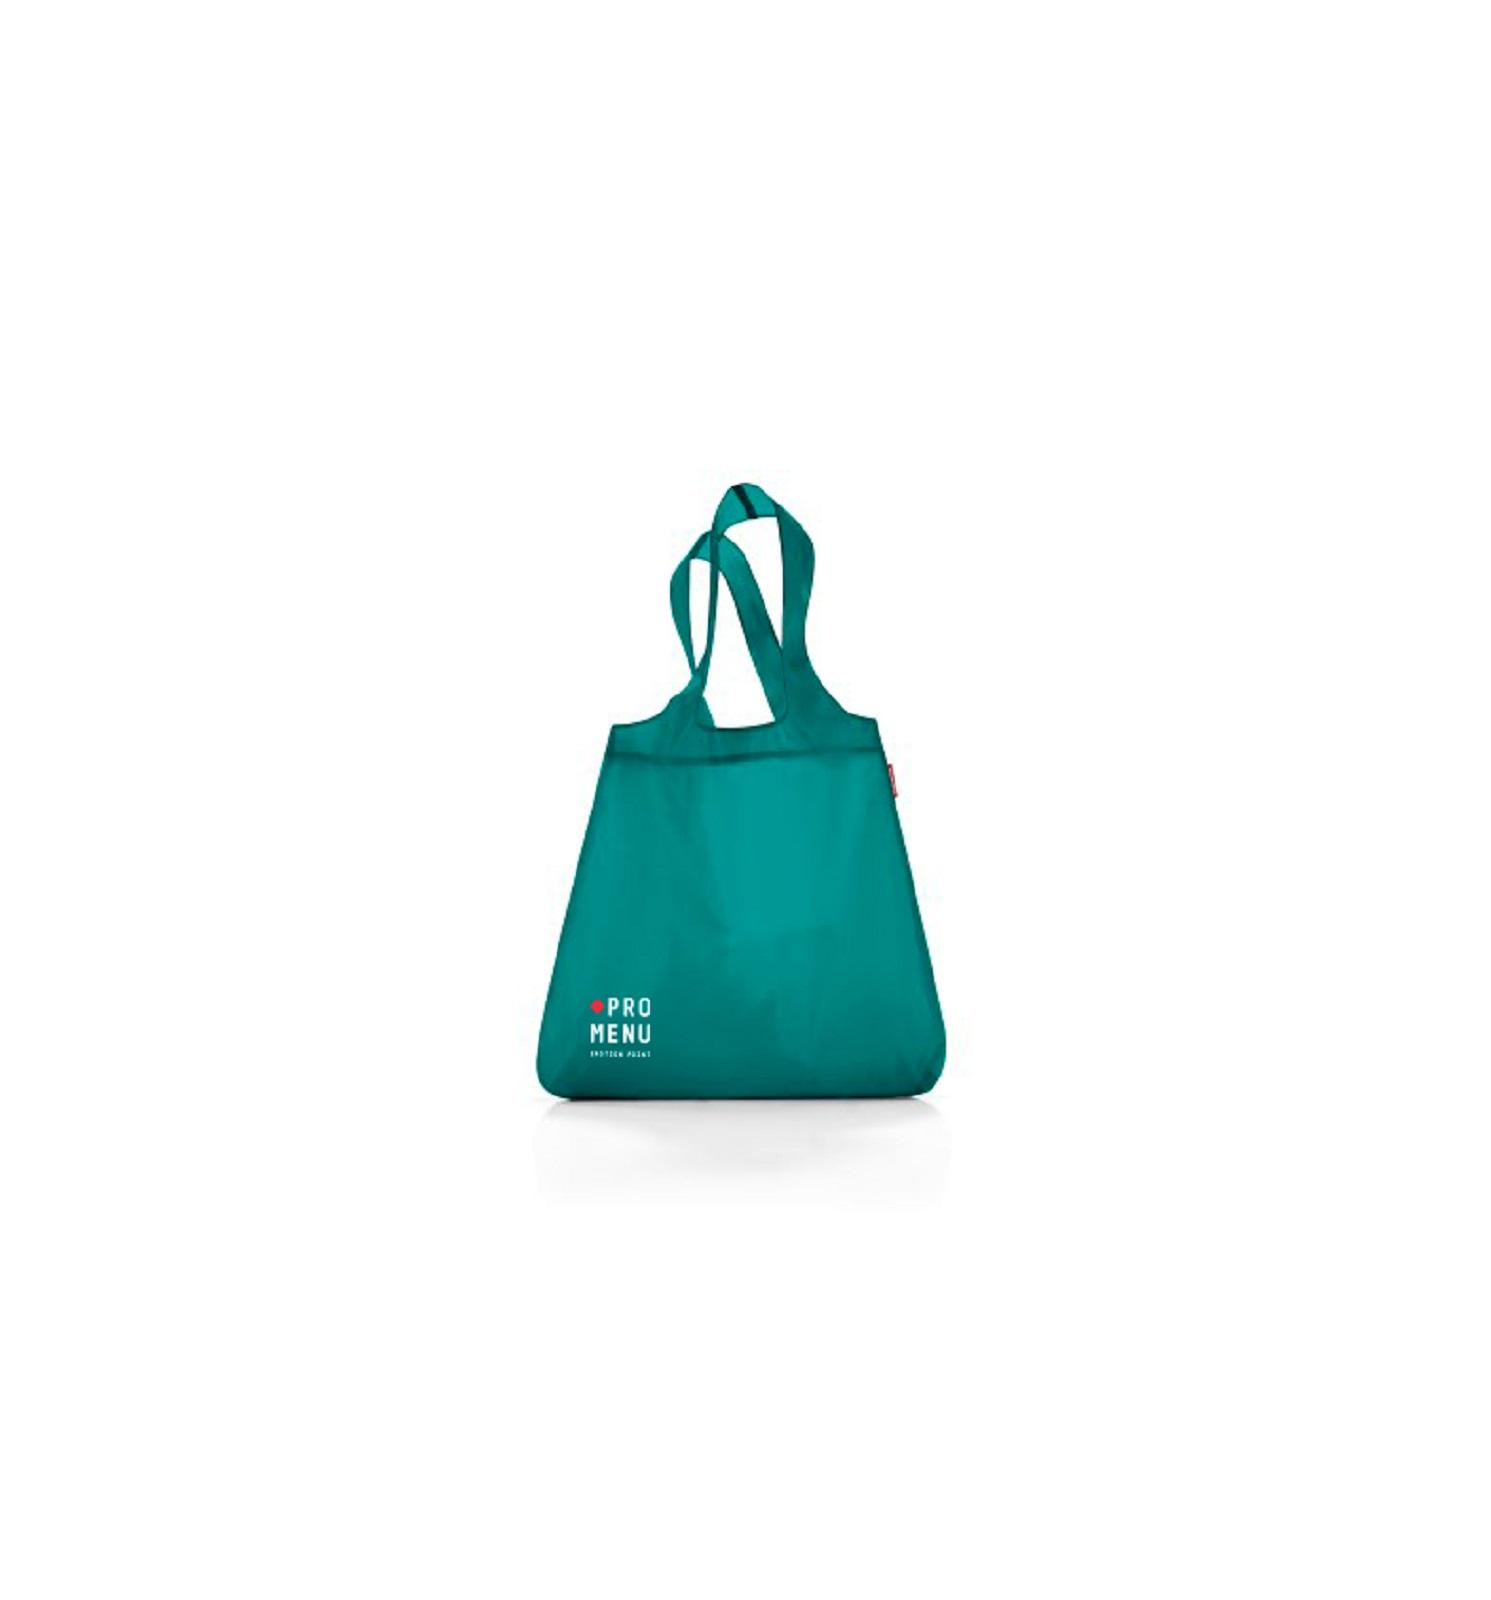 Сумка для шоппинга с лого Promenu Reisenthel Mini maxi shopper collection, 43,5 х 63 х 6 cм, цвет в ассортименте Reisenthel AT 0002LOGO фото 5